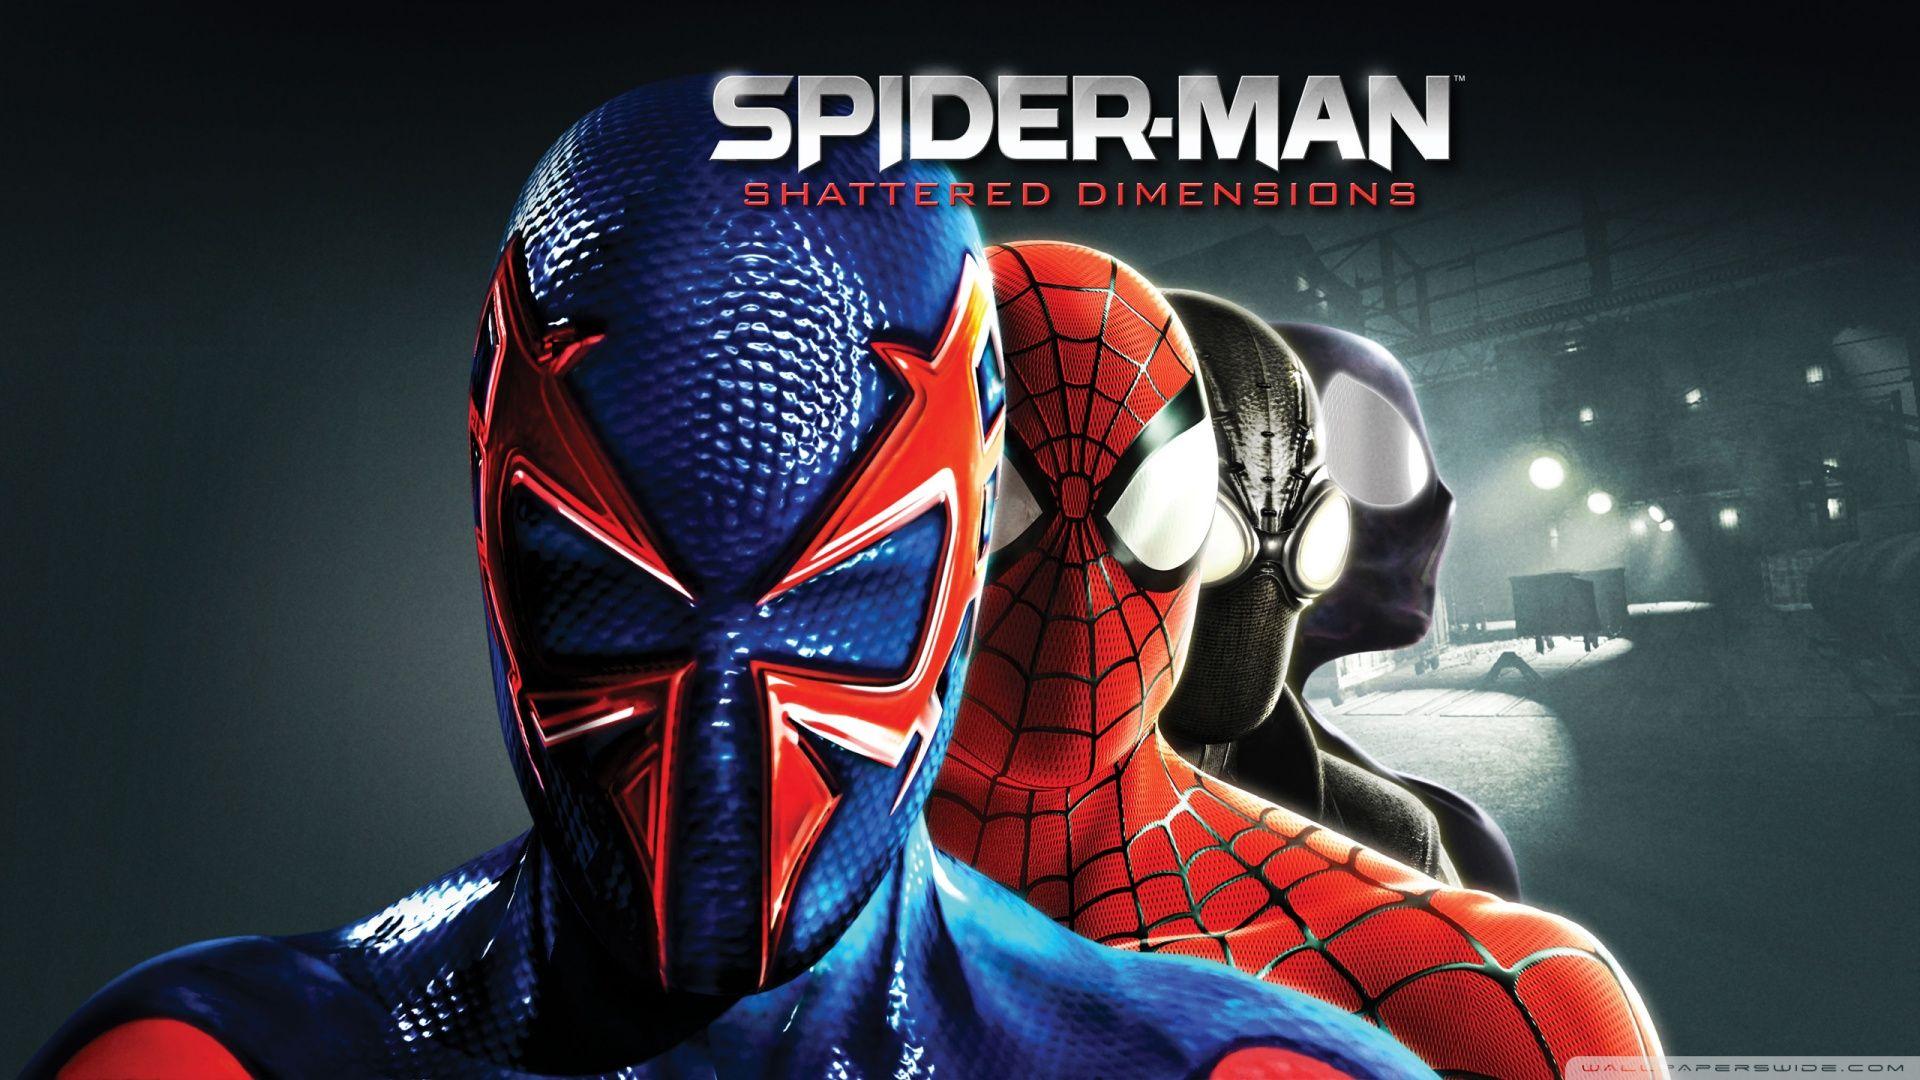 Spider Man Shattered Dimensions Wallpaper Via Http Wallpoper Com Spider Man Shattered Dimensions Spiderman Marvel Comics Wallpaper